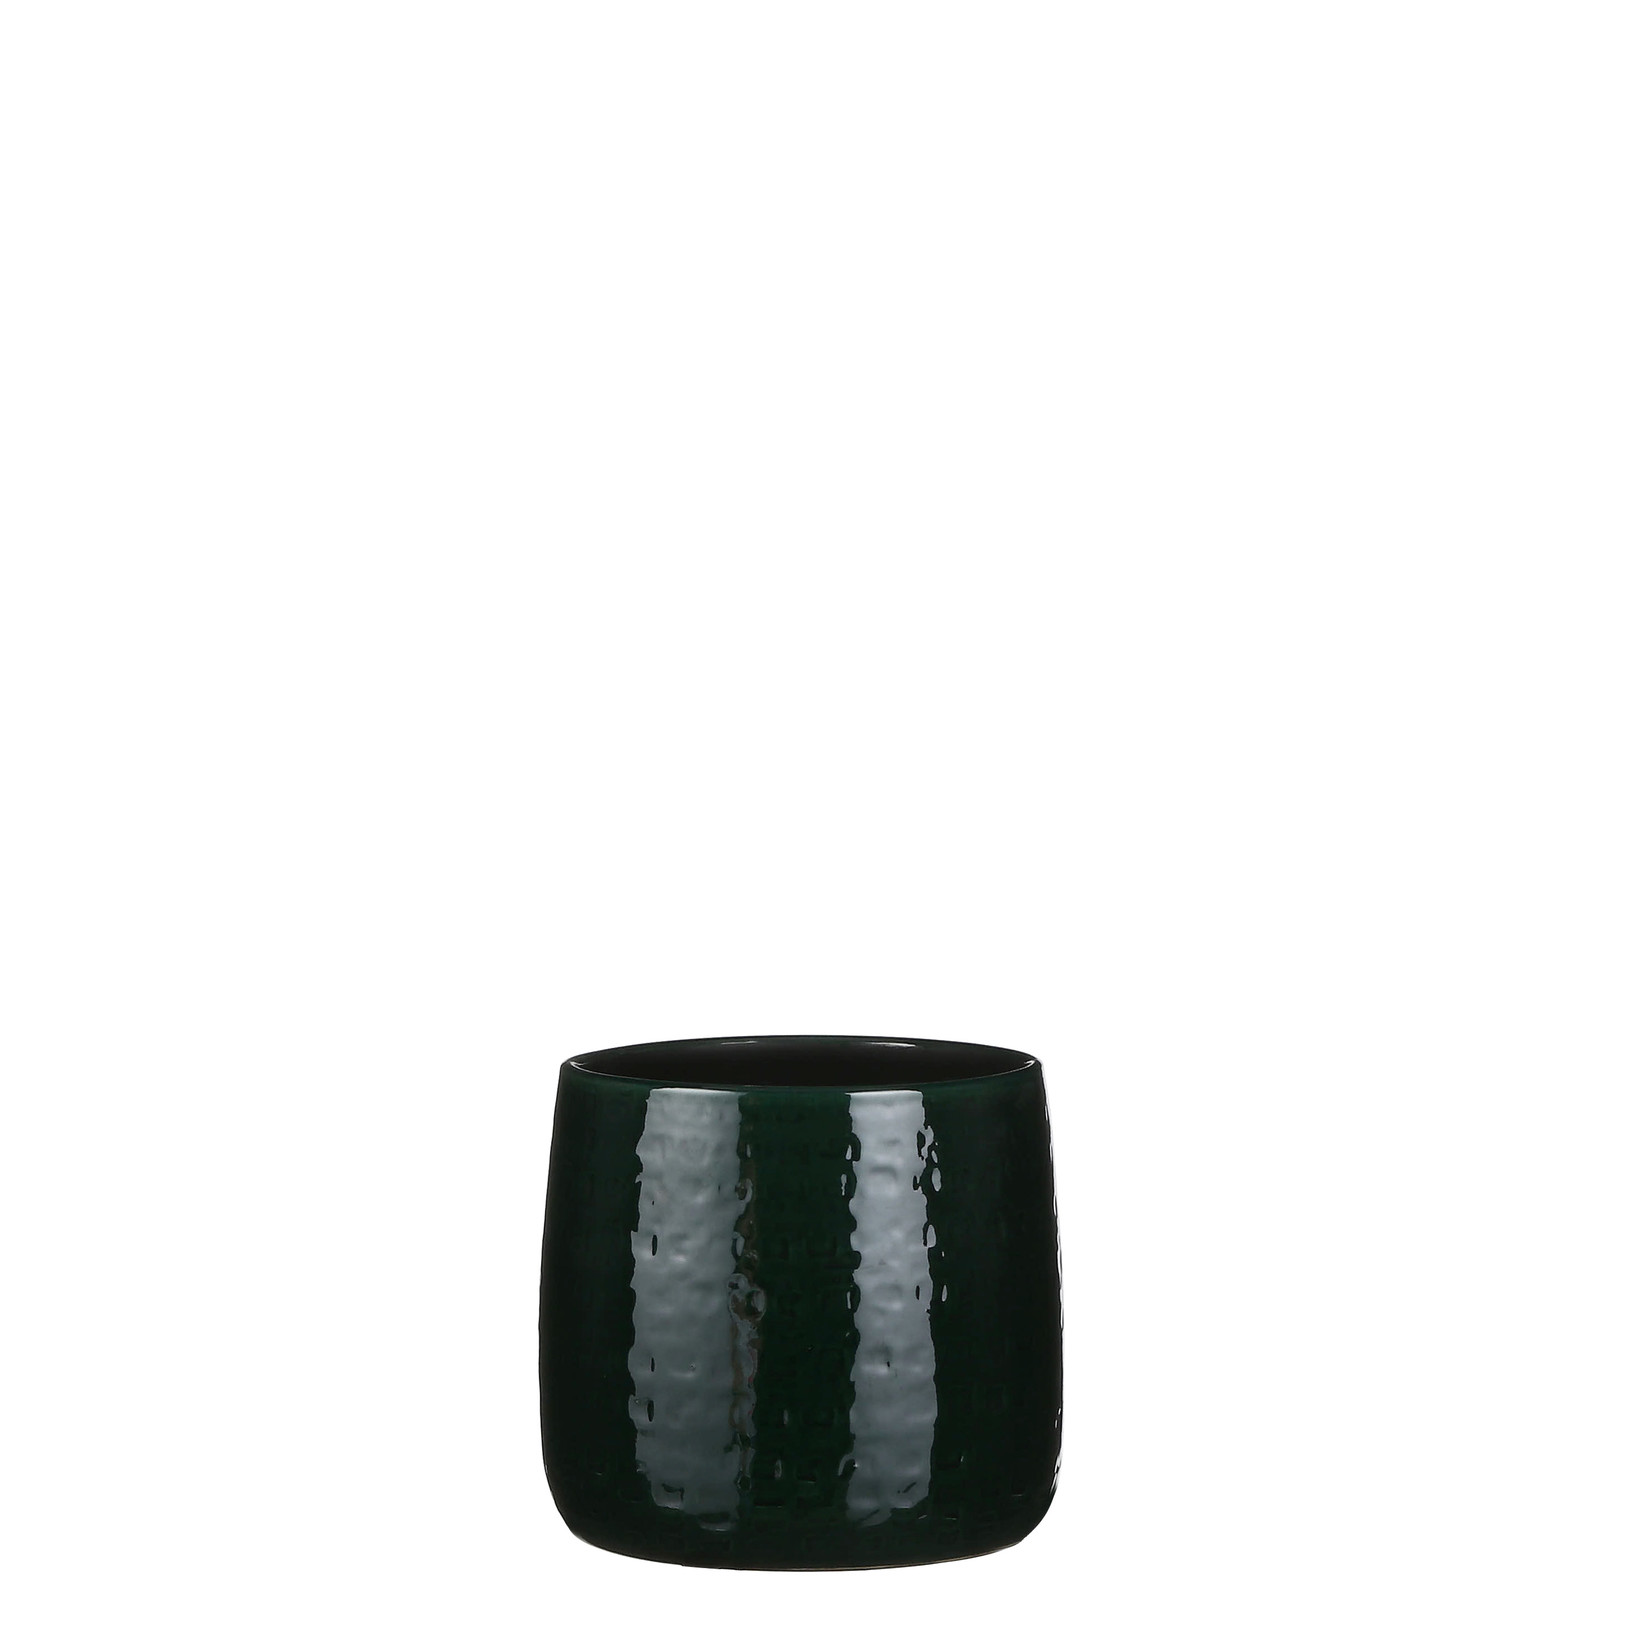 MiCa 1060626 Floyd pot around green